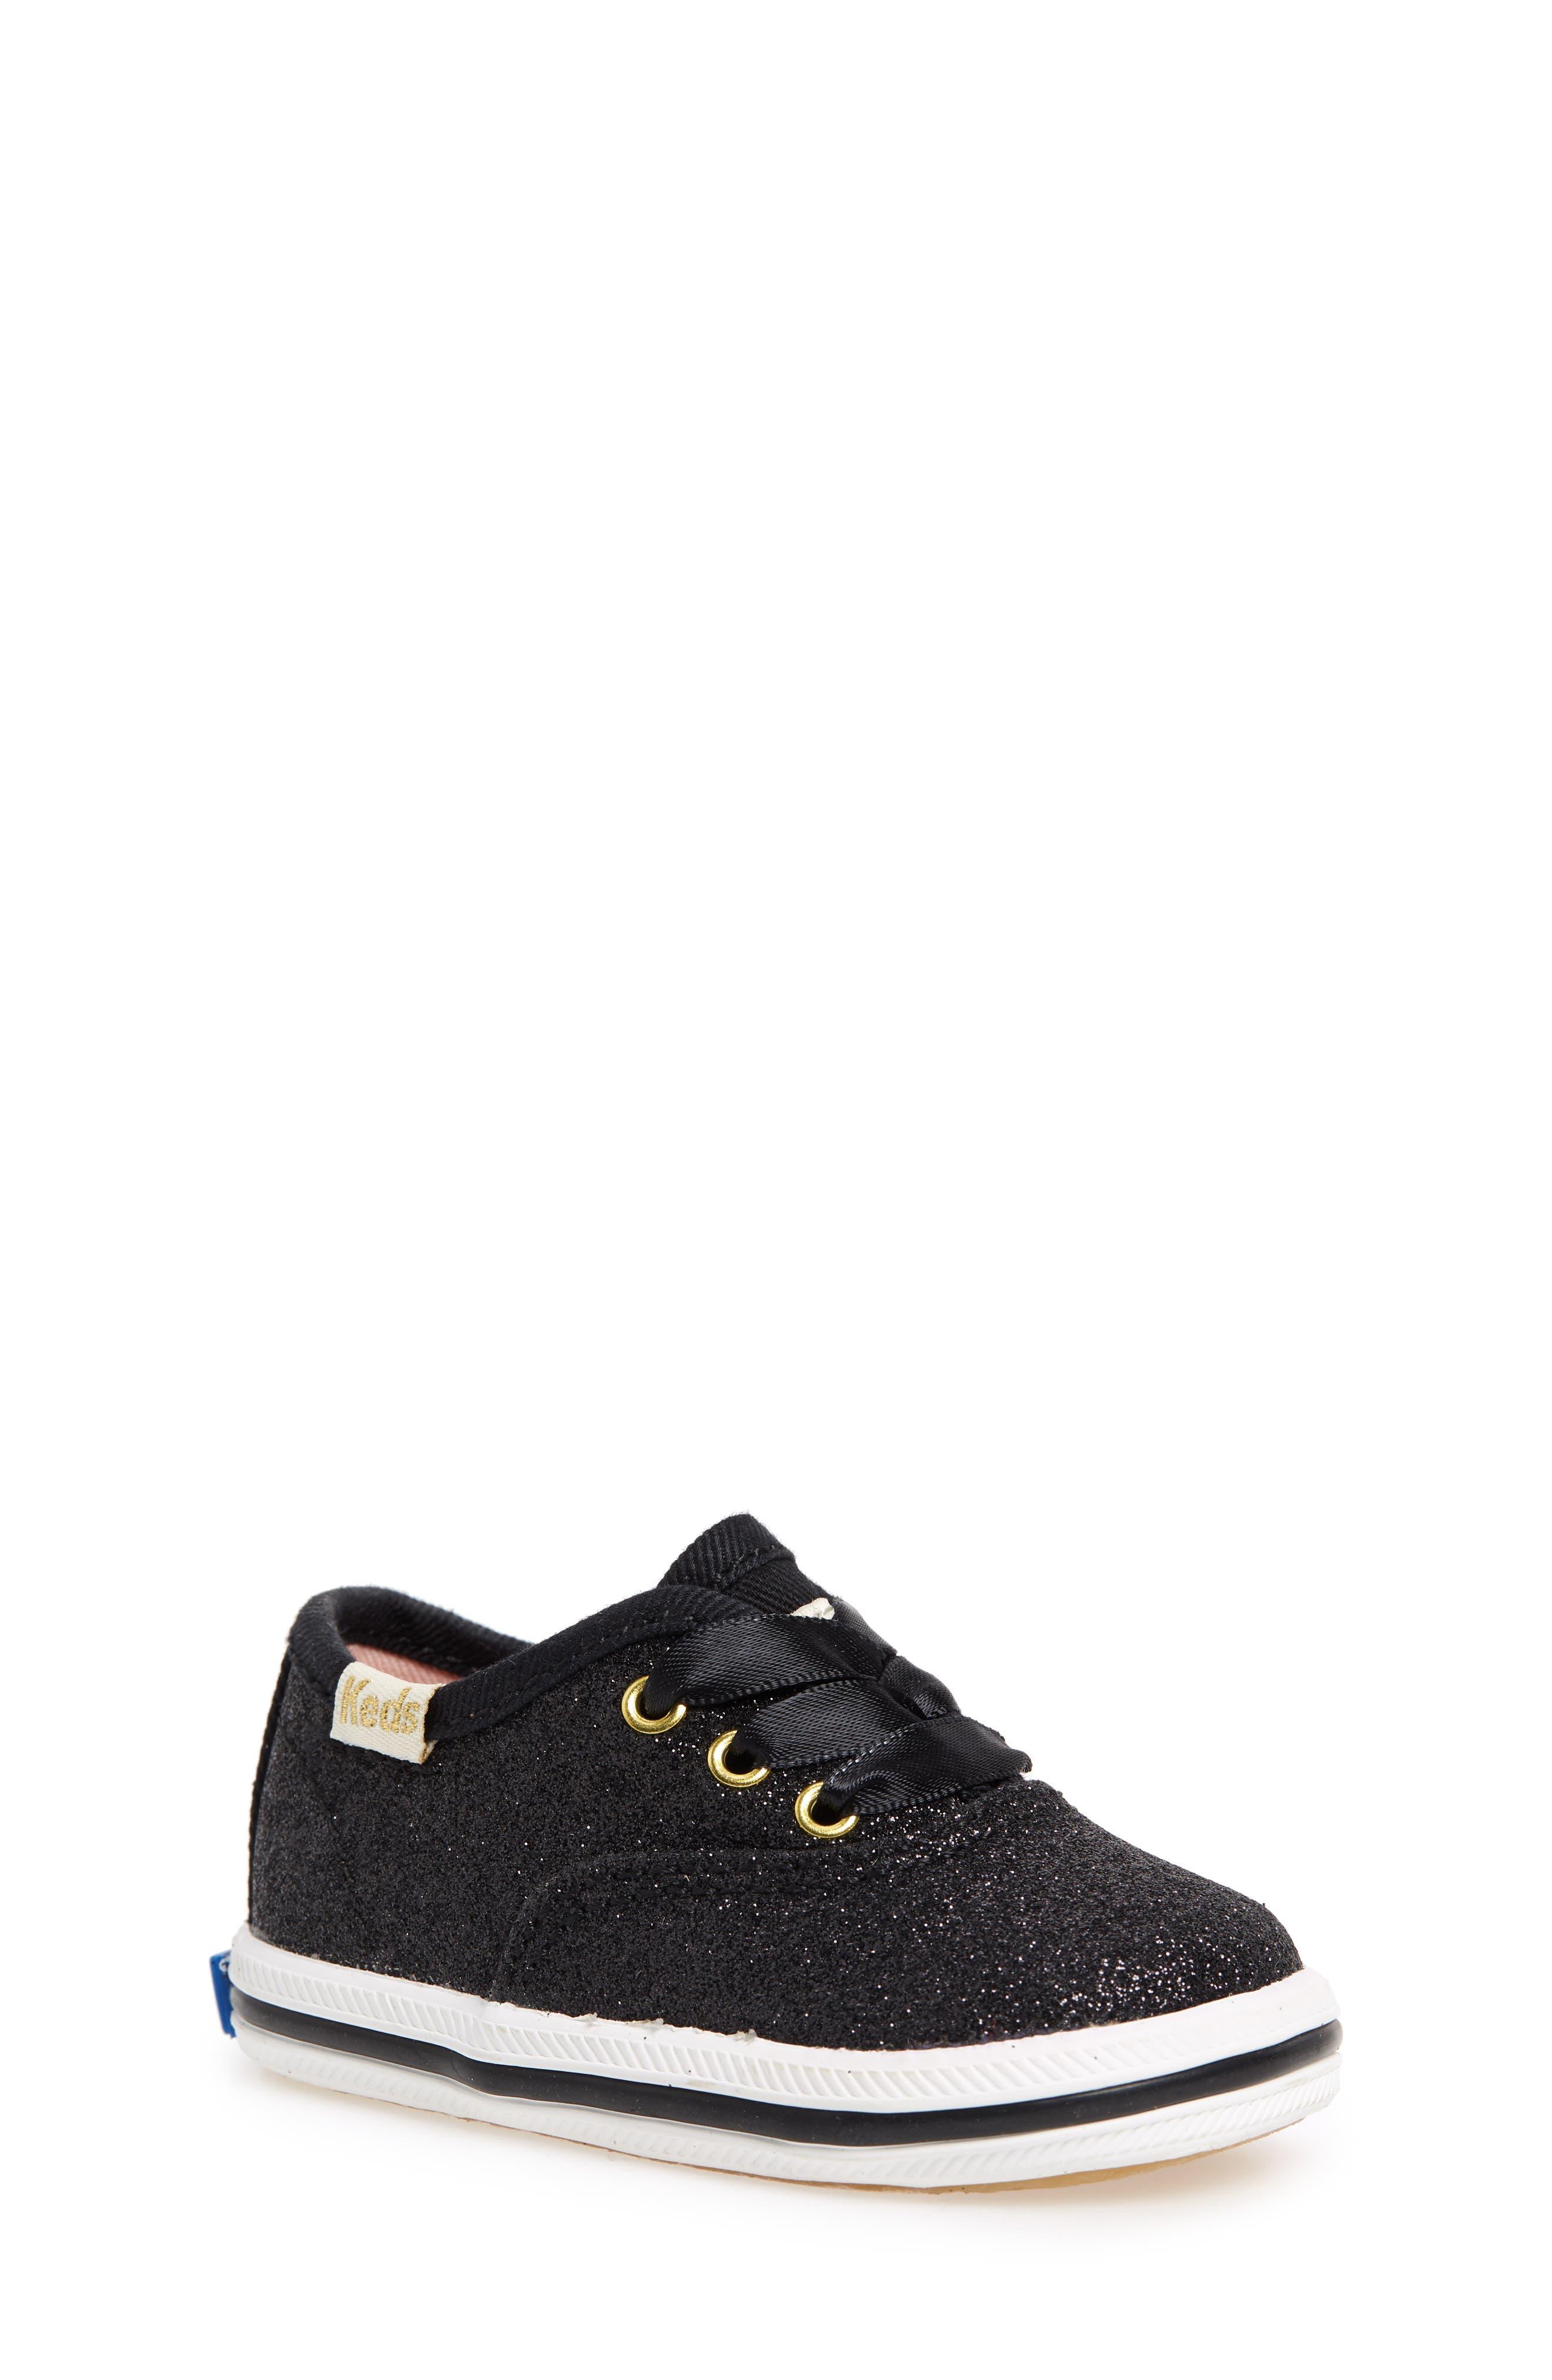 x kate spade new york Champion Glitter Crib Shoe,                         Main,                         color, Black